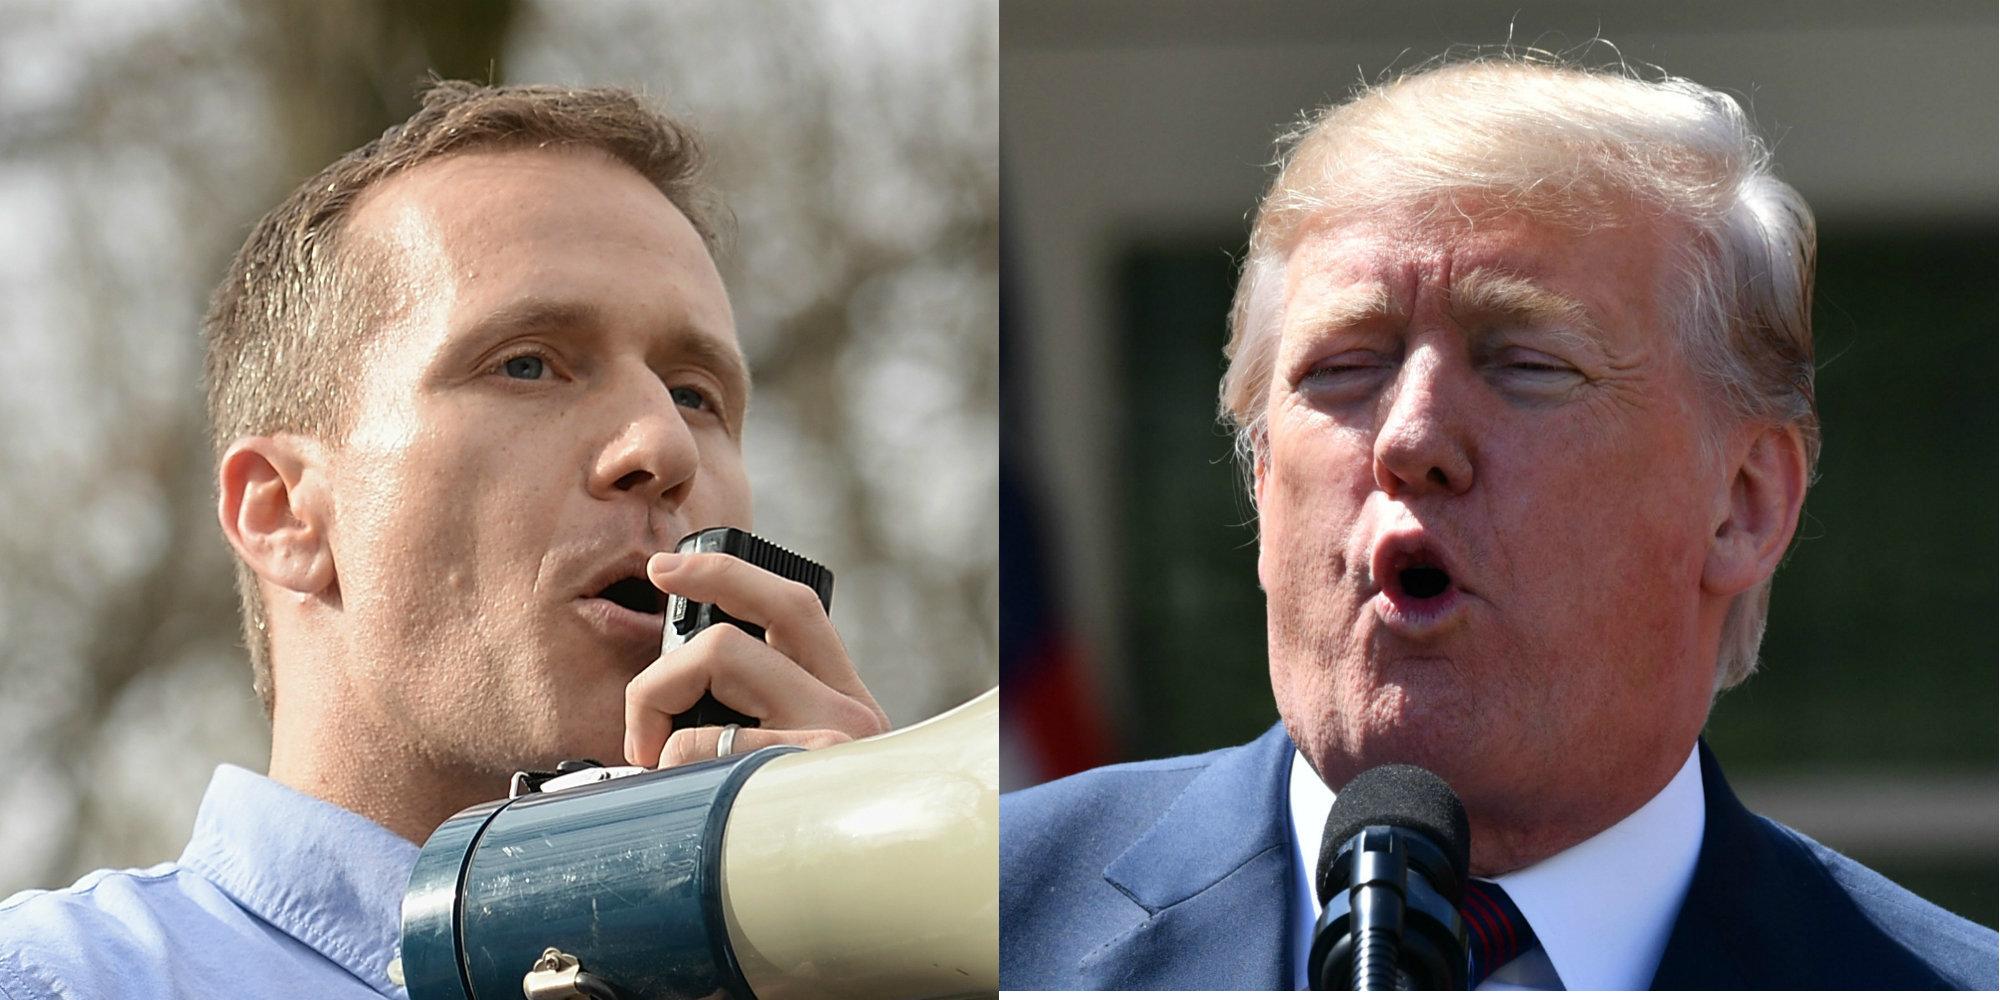 GOP senator to Trump: Ask Greitens to resign